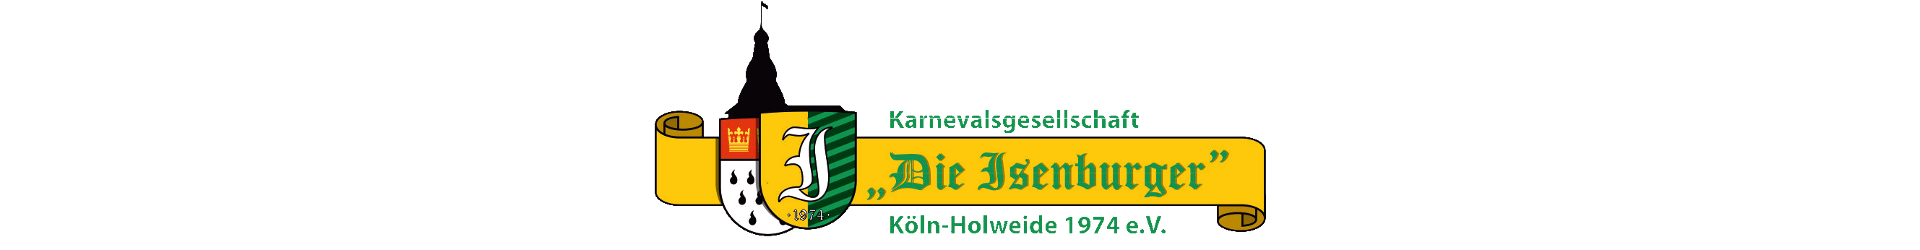 "Karnevalsgesellschaft ""Die Isenburger"" Köln-Holweide von 1974 e. V."